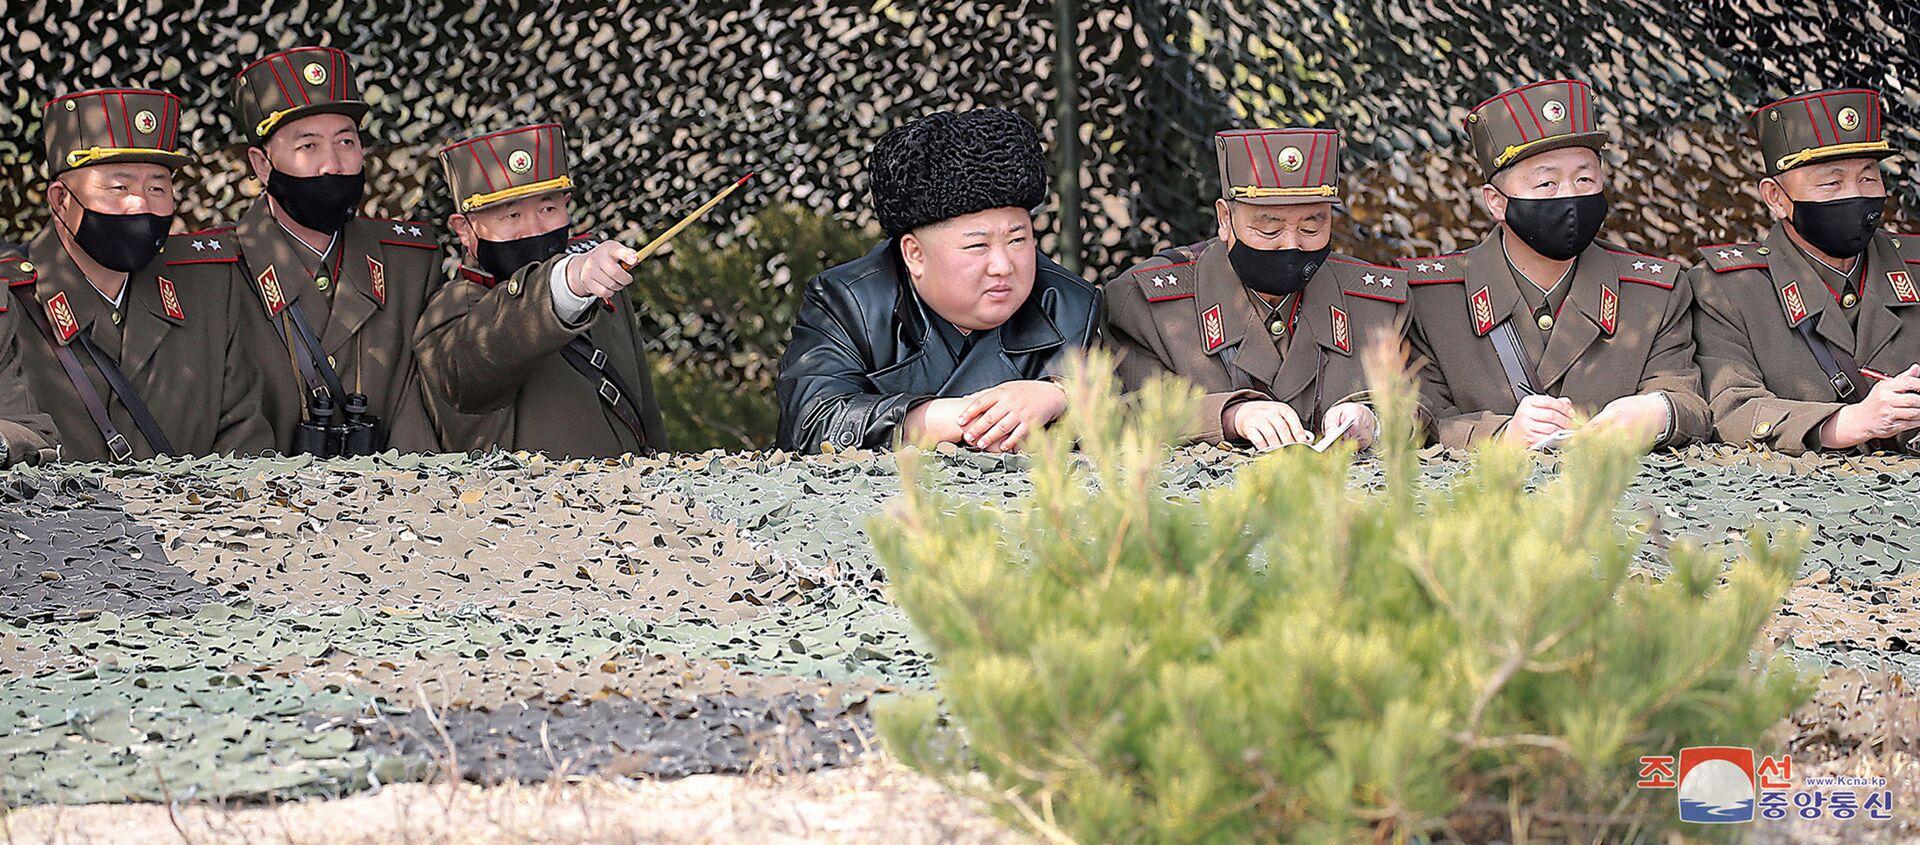 El líder de Corea del Norte, Kim Jong-un, observa los ejercicios militares - Sputnik Mundo, 1920, 19.03.2020